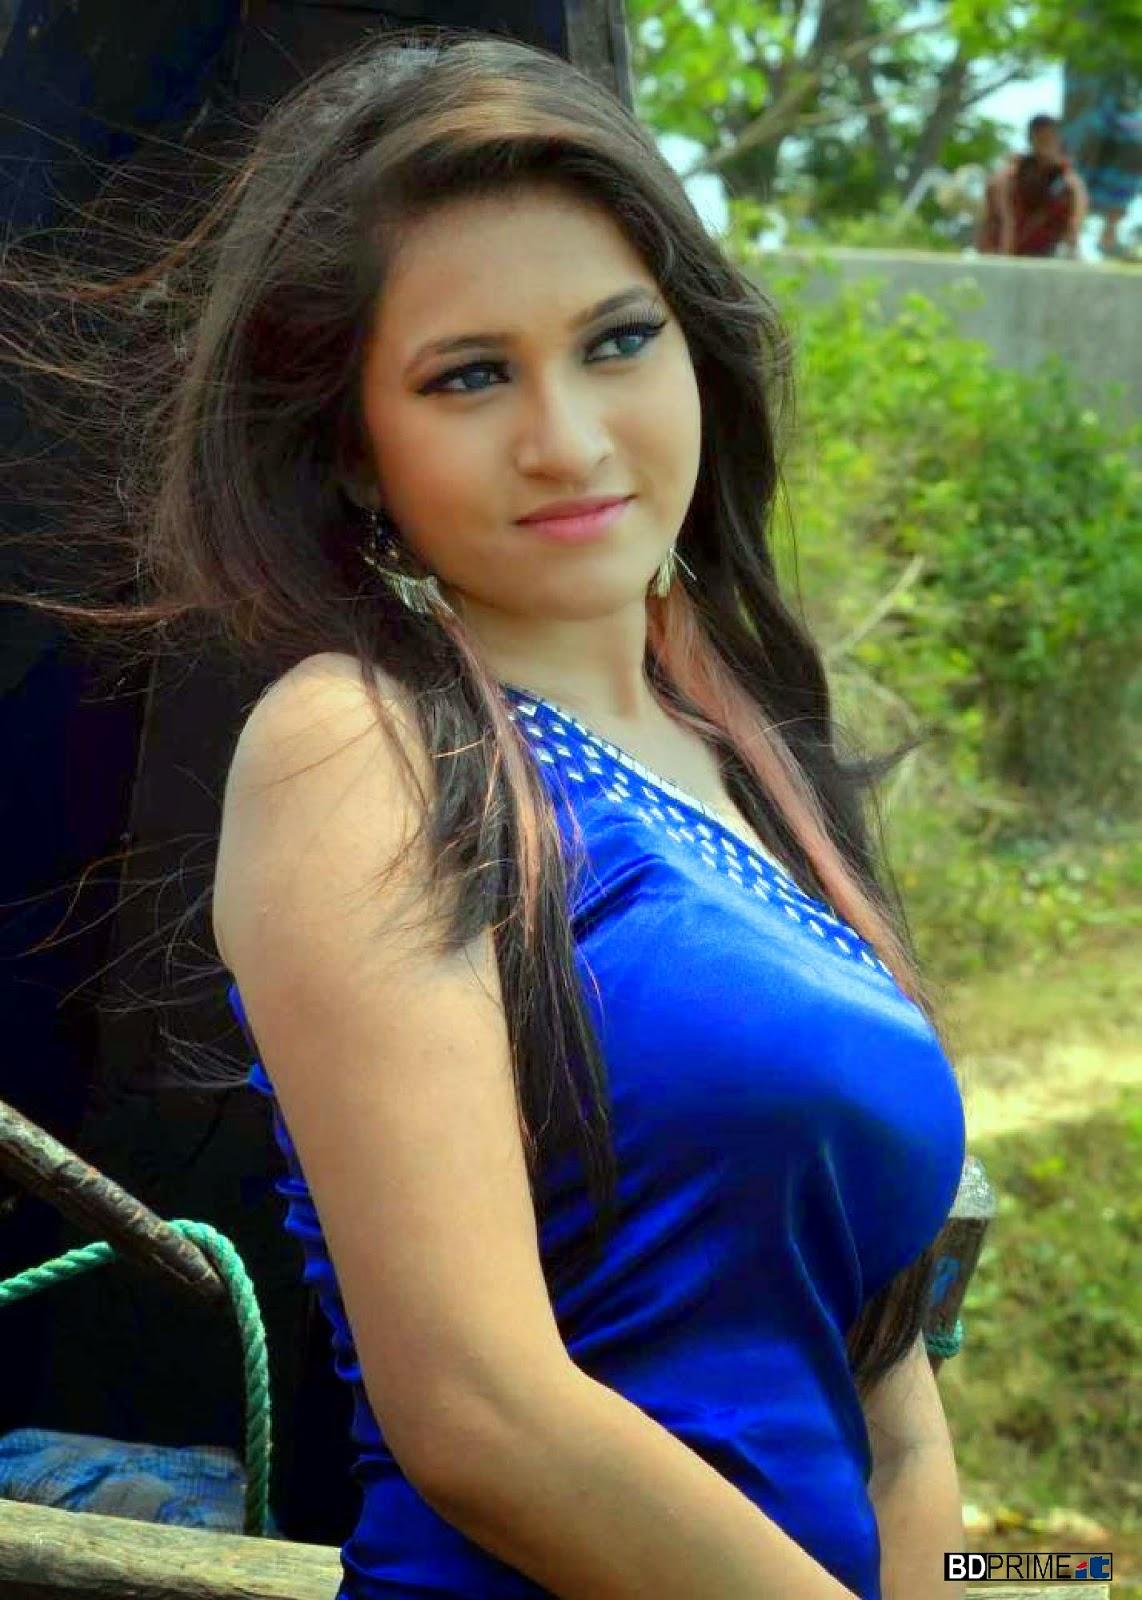 Bangladesh phone sex girl number 01797031365 mitu - 5 2